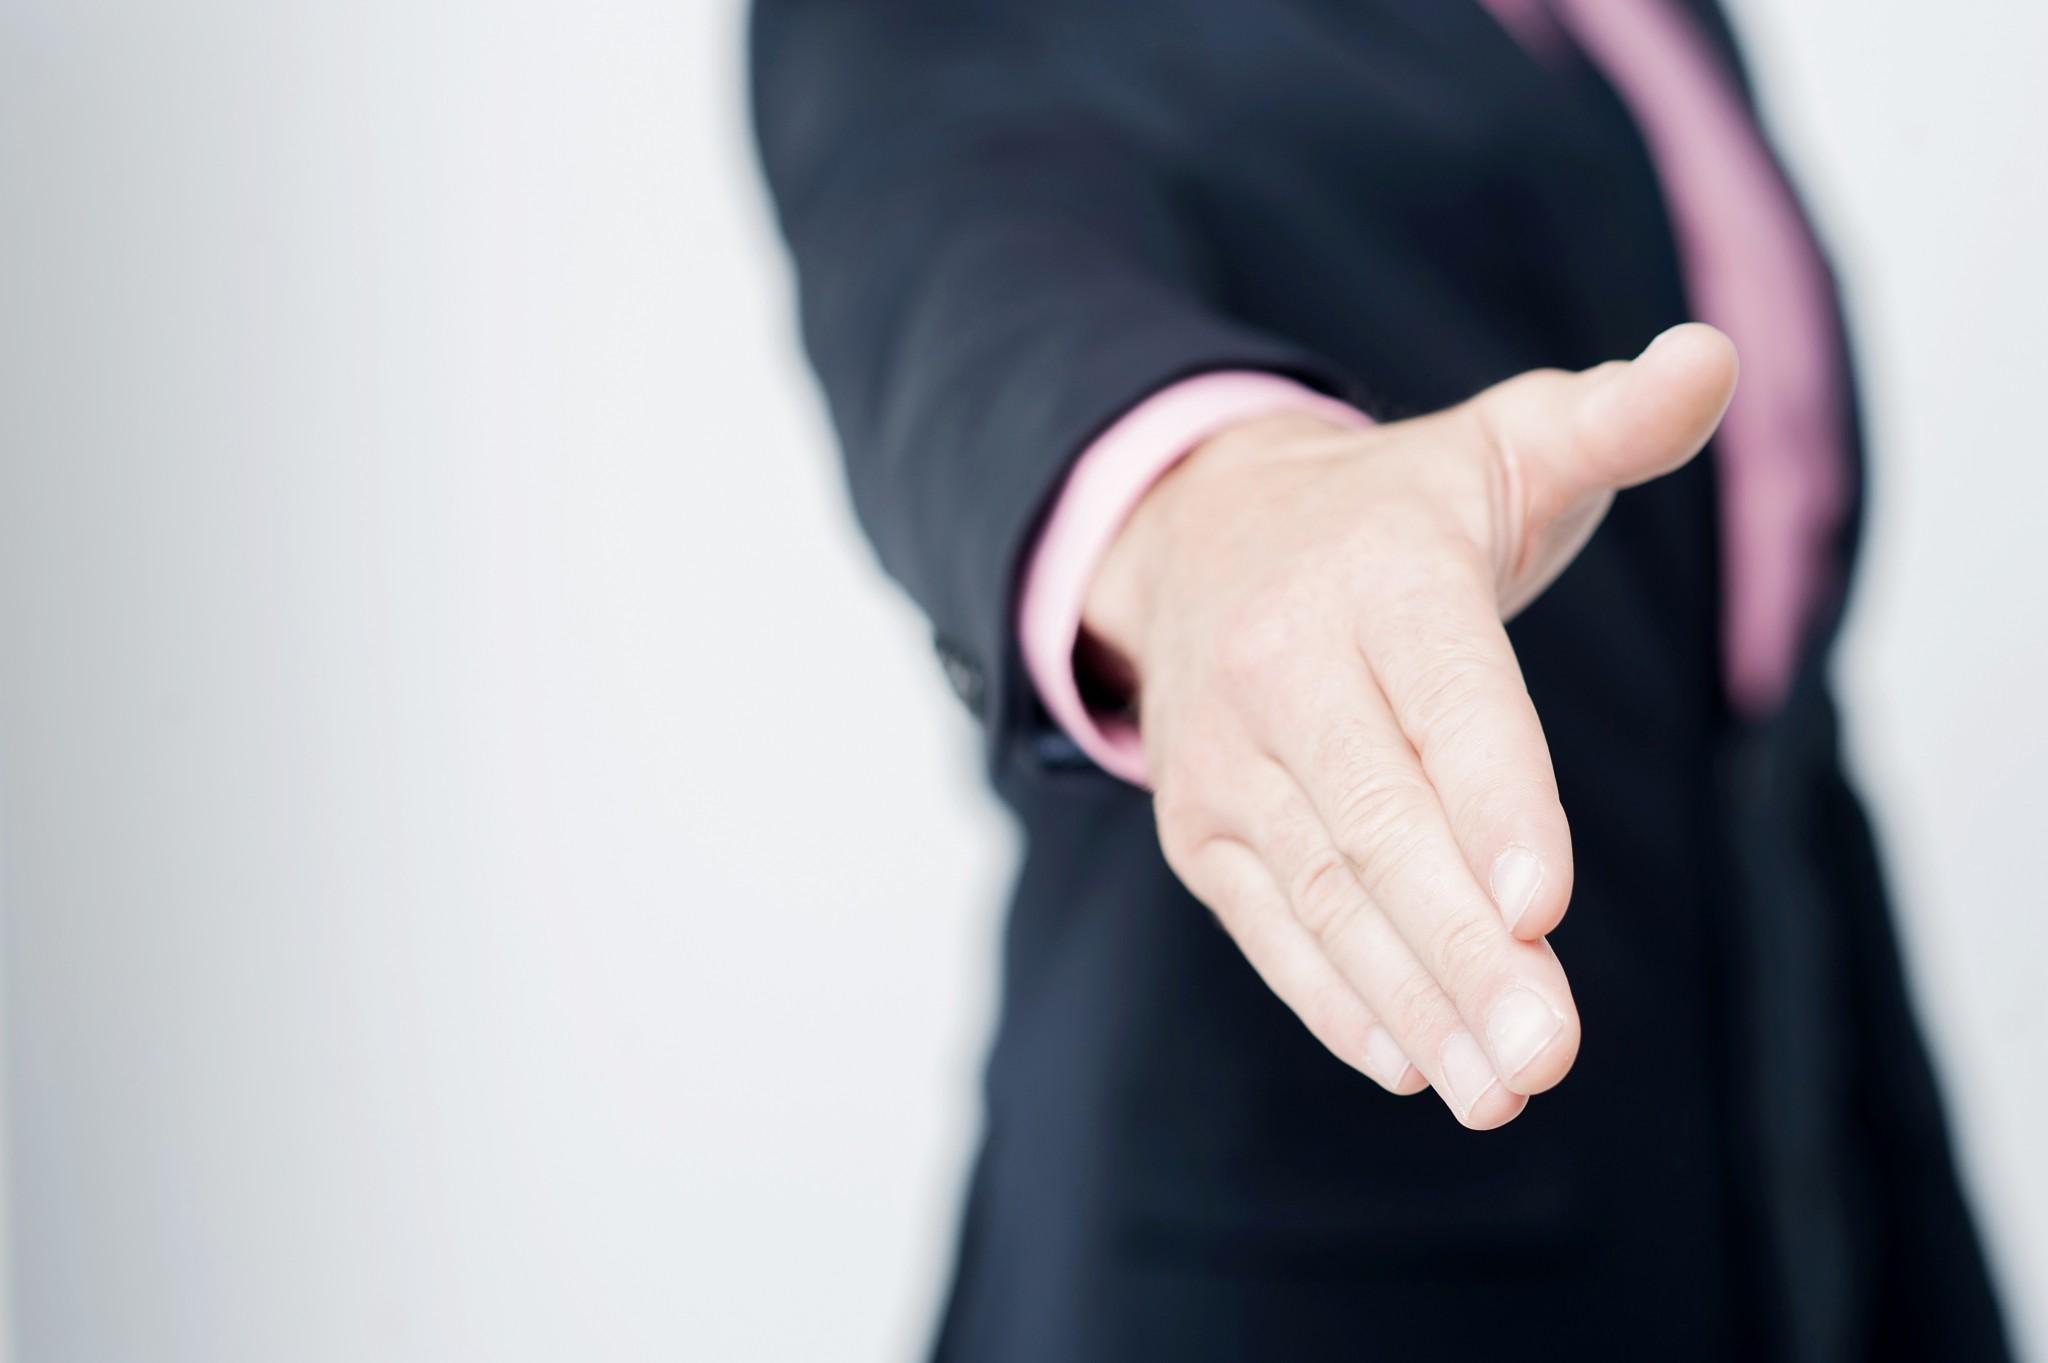 bigstock-Man-Offering-A-Handshake-Gree-79597891